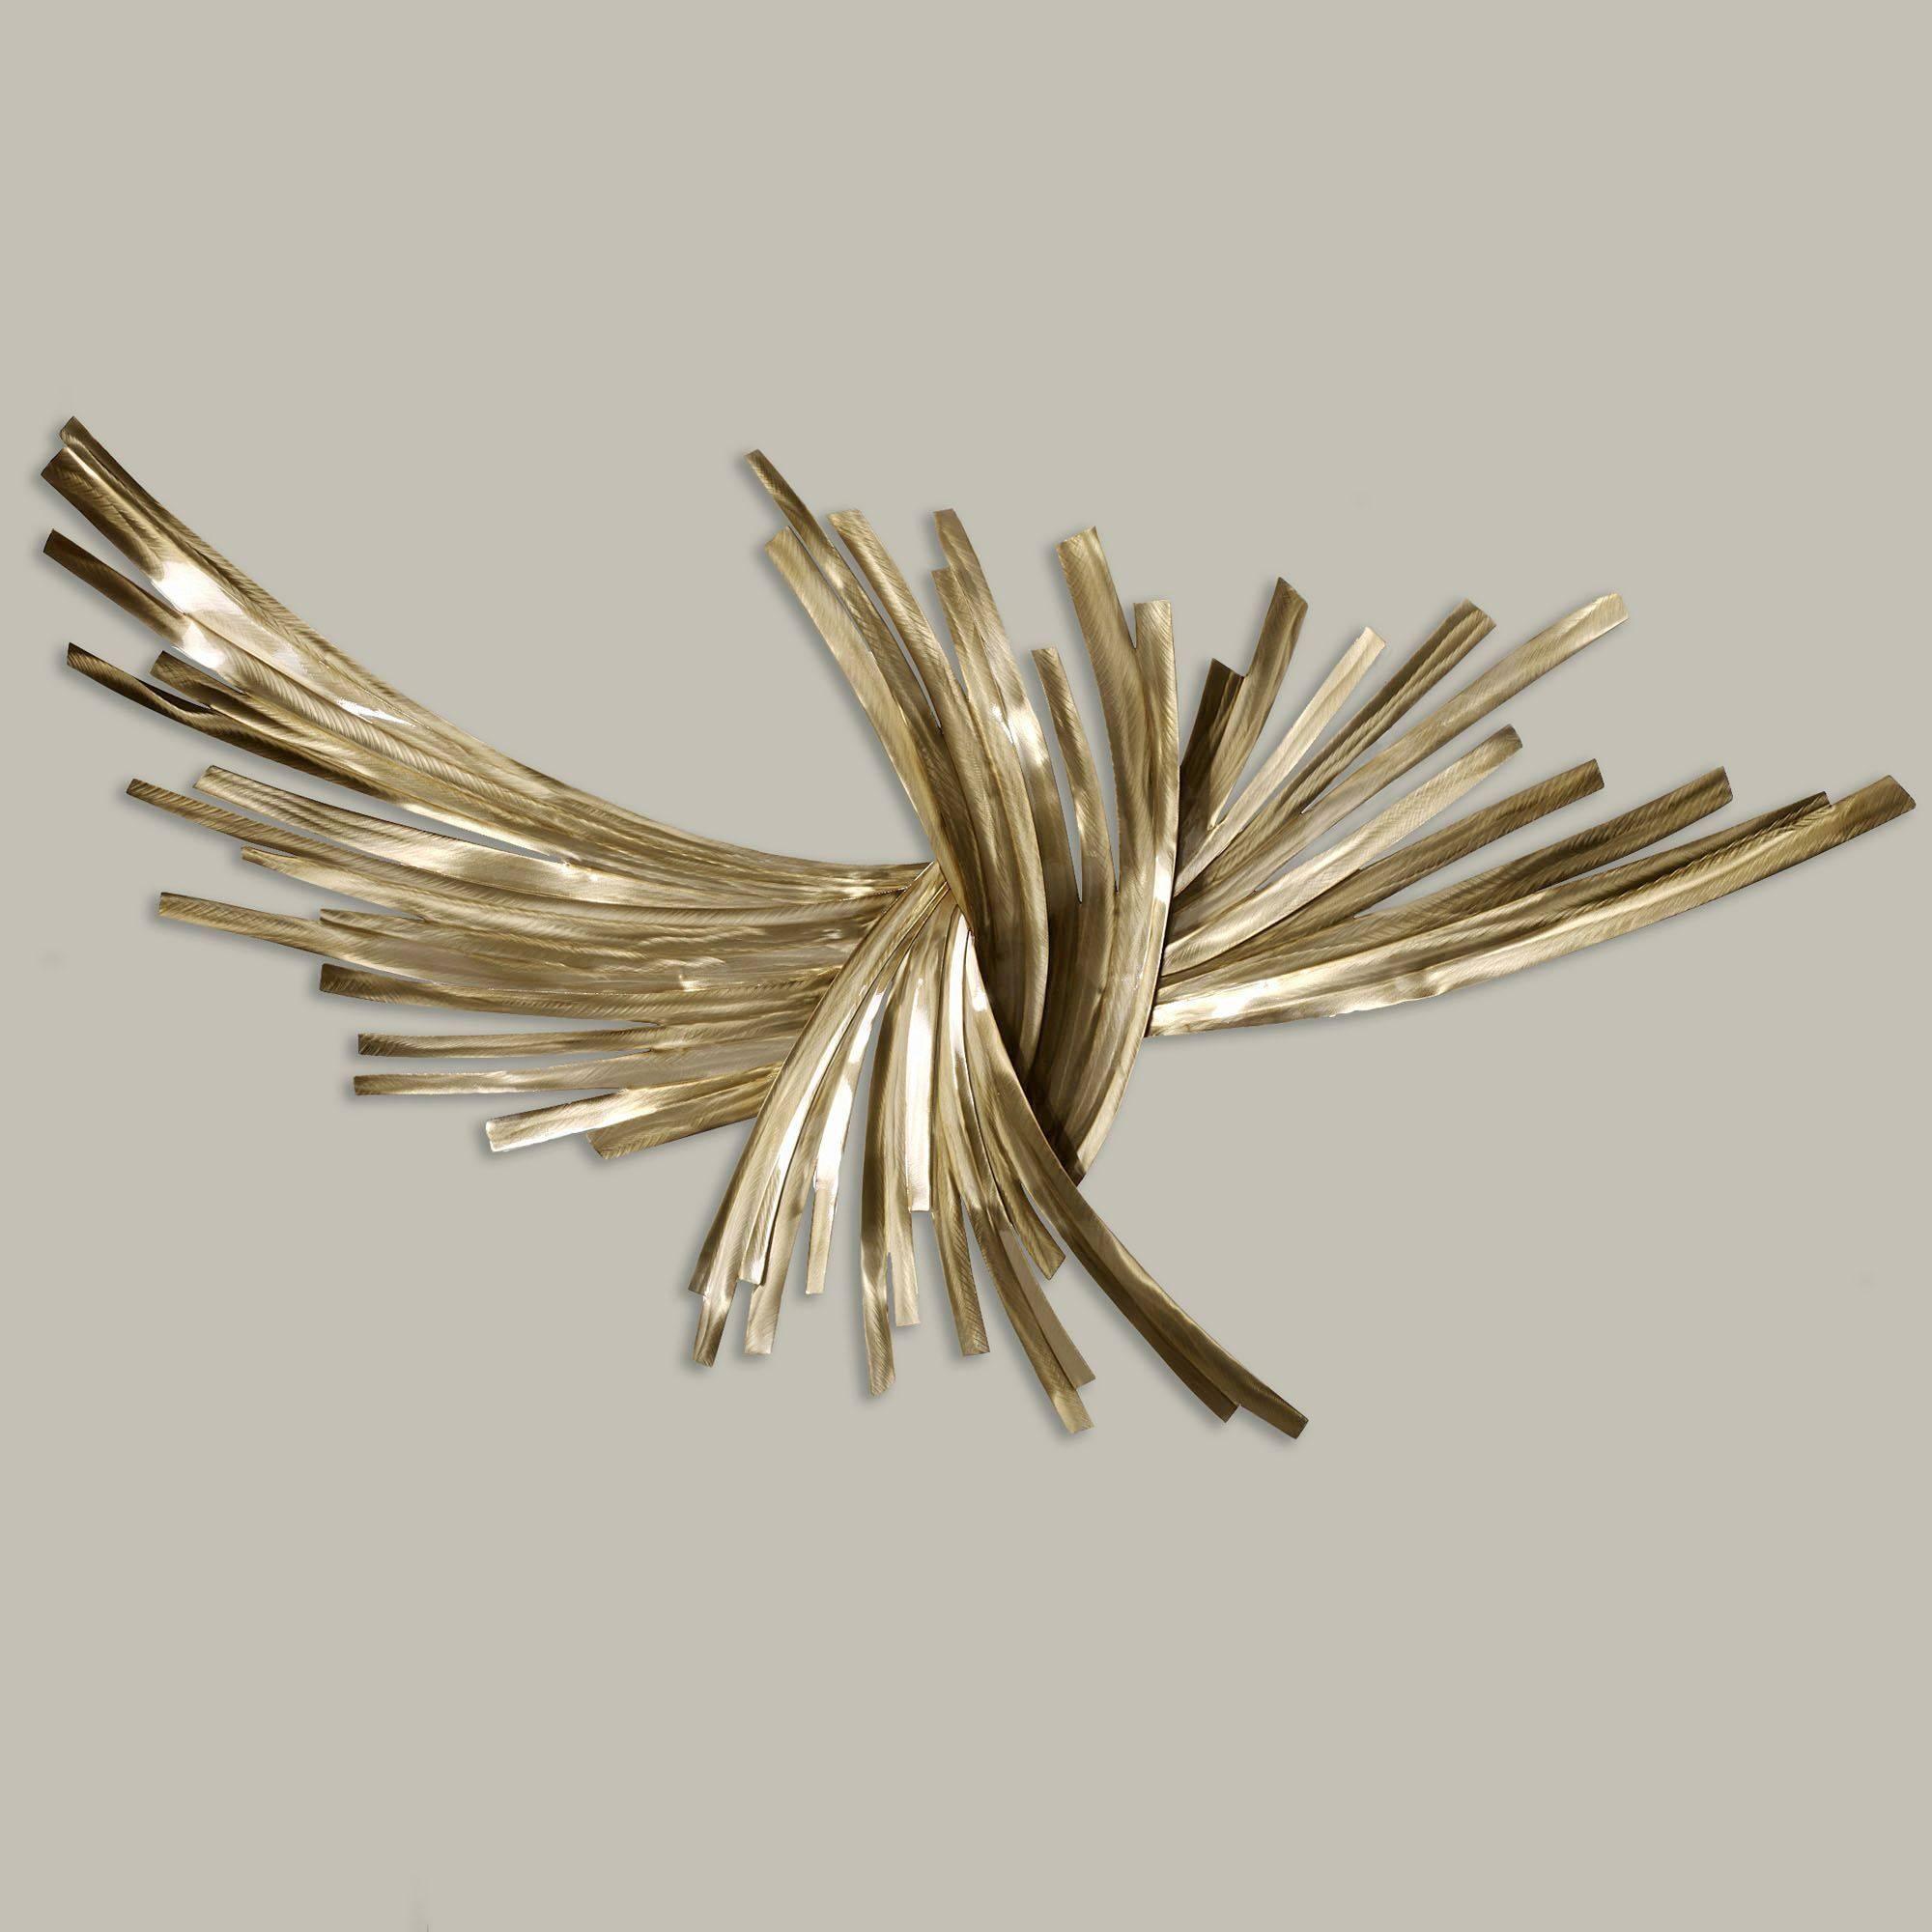 Infinity Gold Metal Wall Sculpture Inside 2018 Gold Metal Wall Art (View 1 of 20)